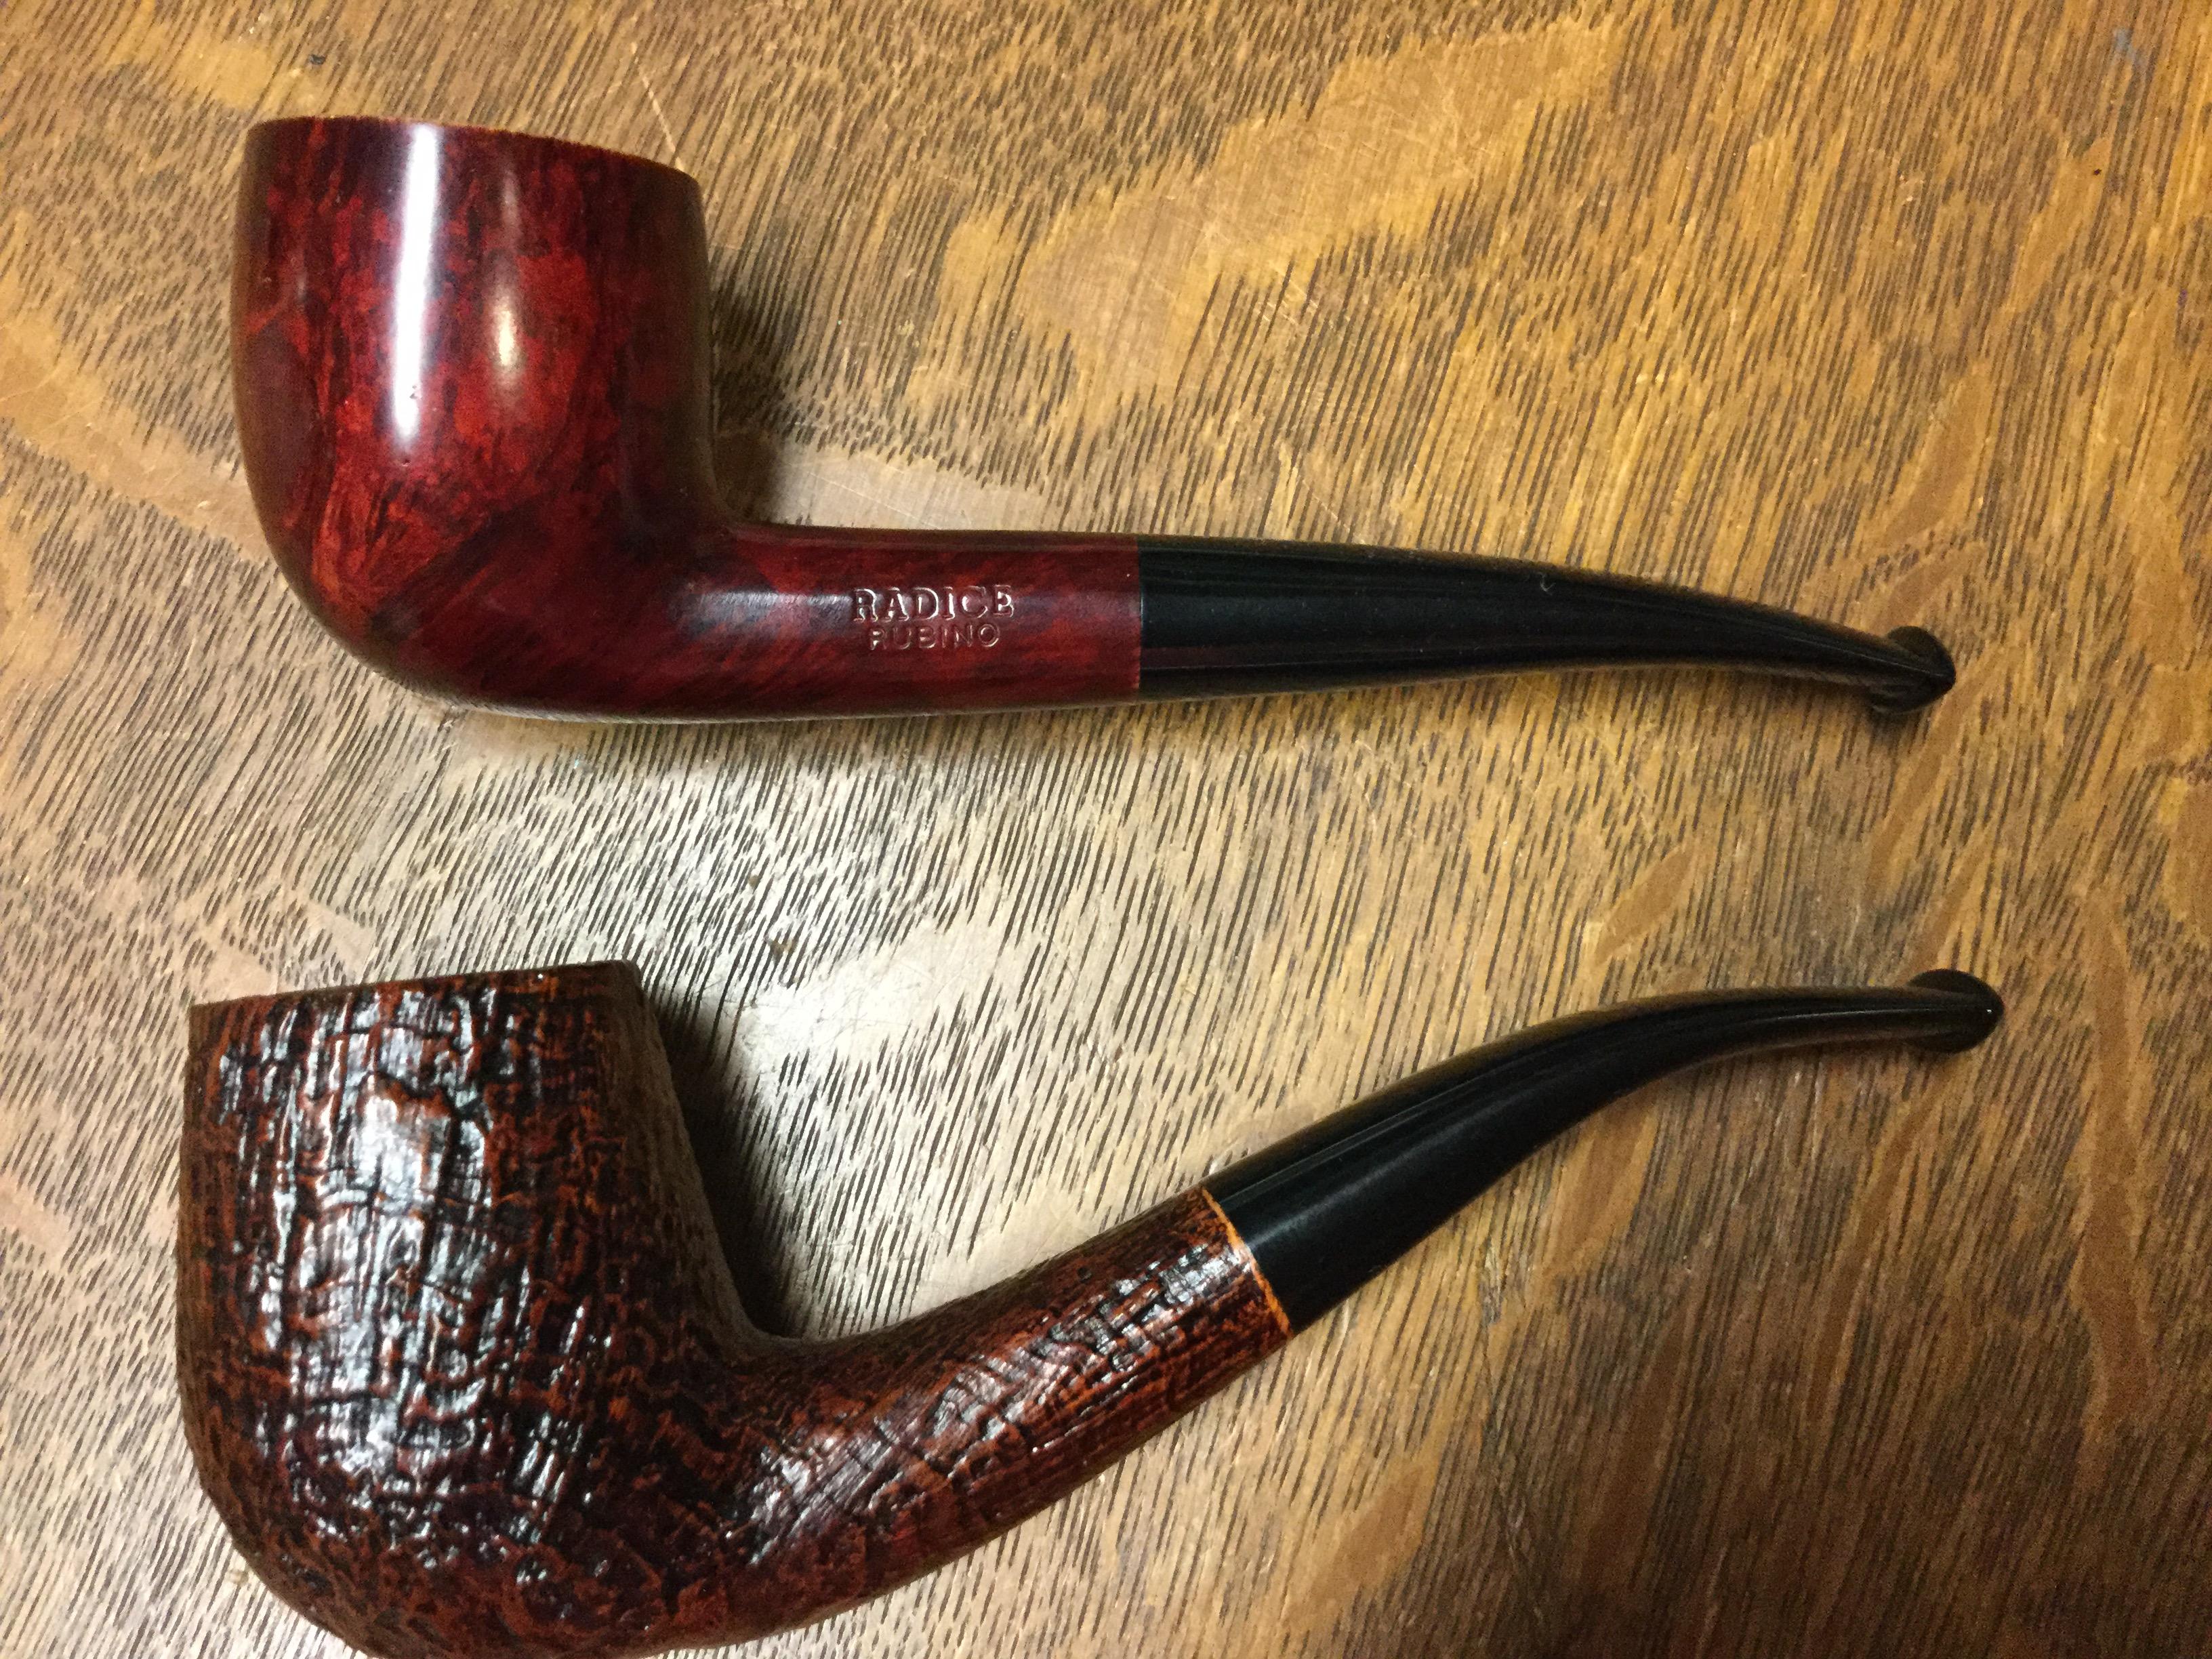 Radice pipe dating